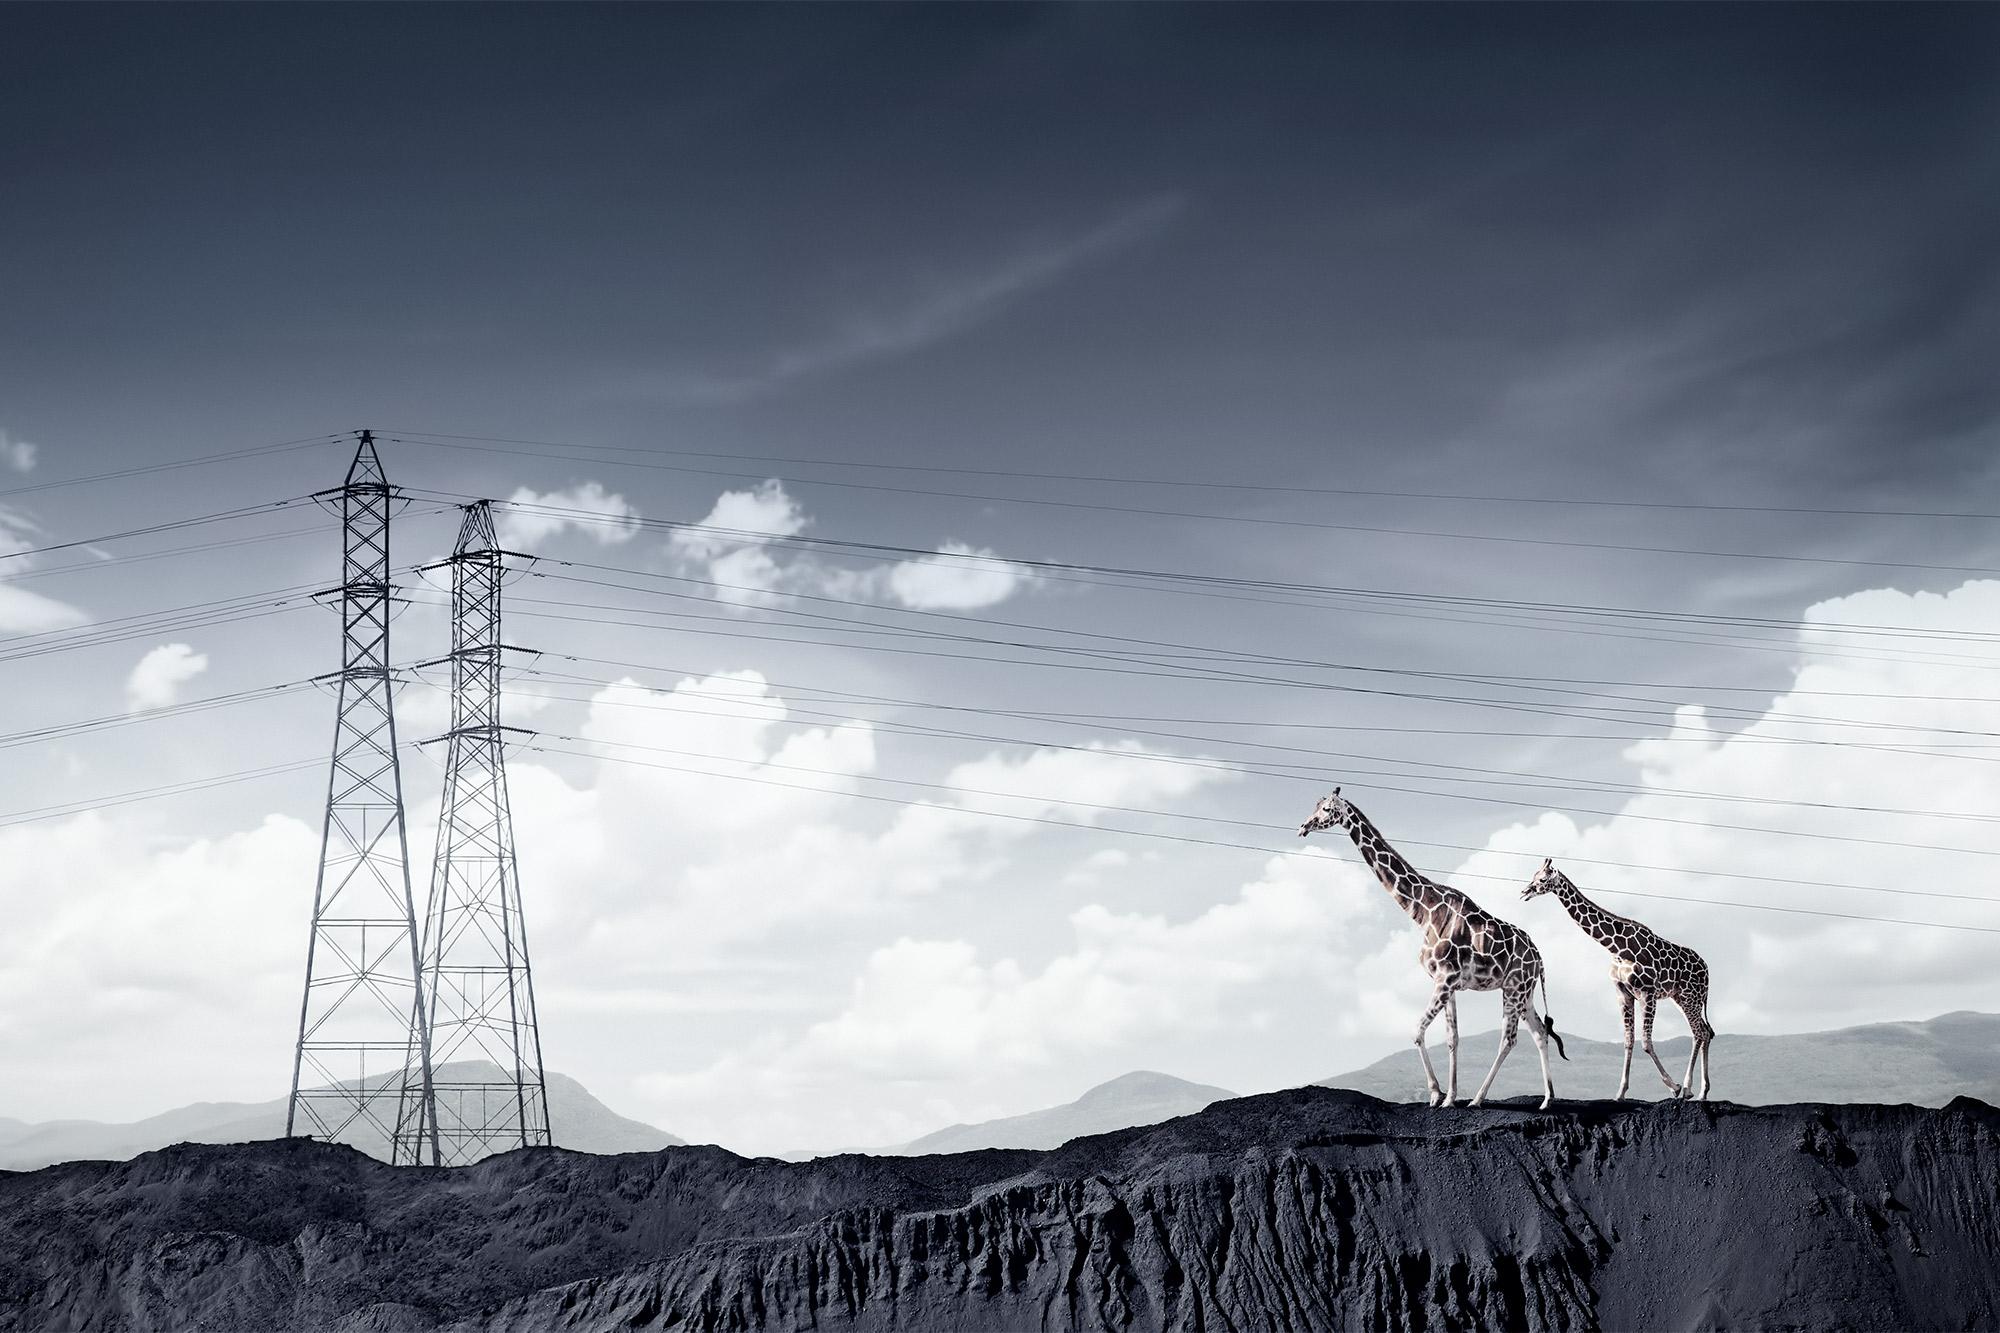 Chris Clor giraffes and electric pylons